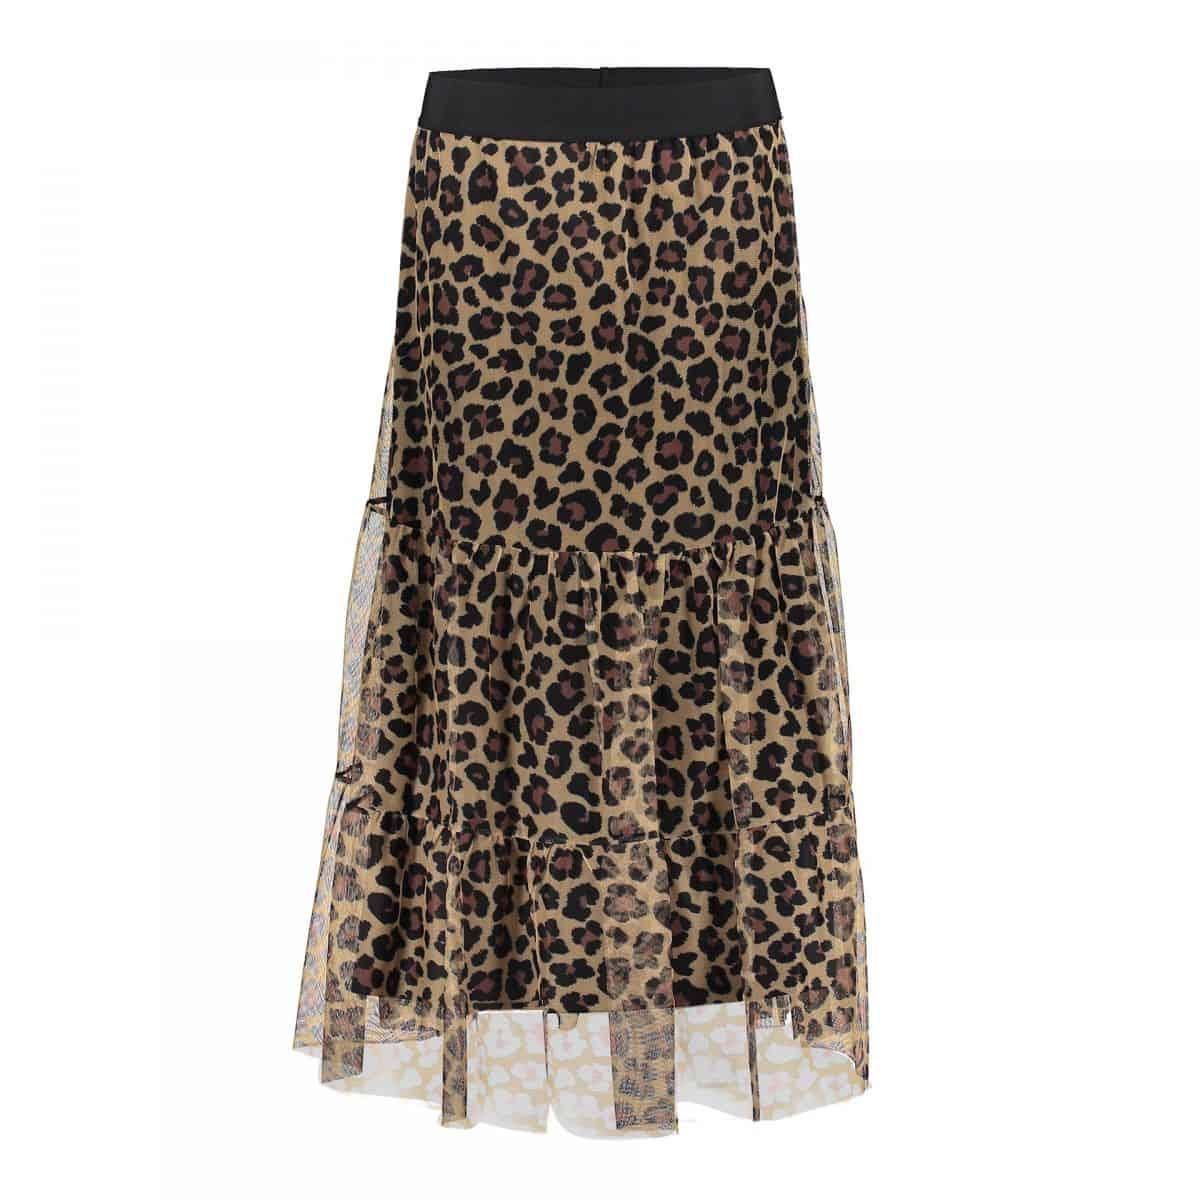 Geisha Skirt Leopard Mesh – S